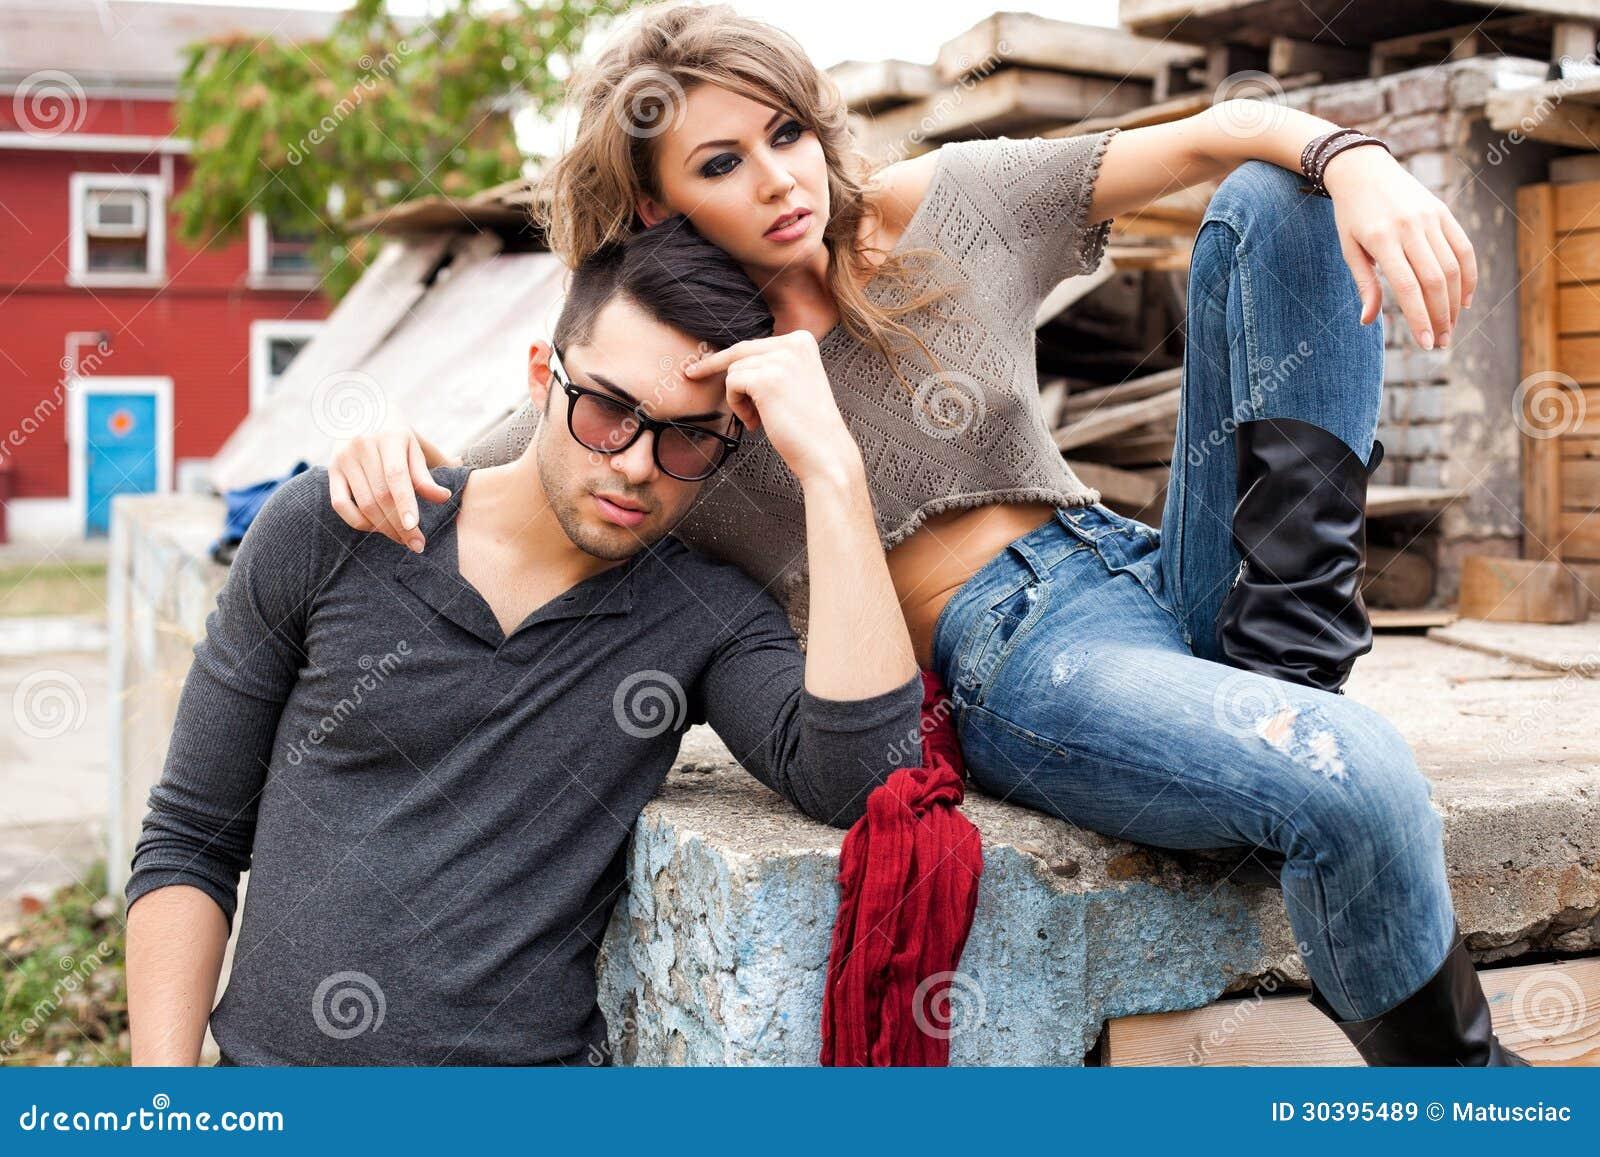 sex hot couple outdoor